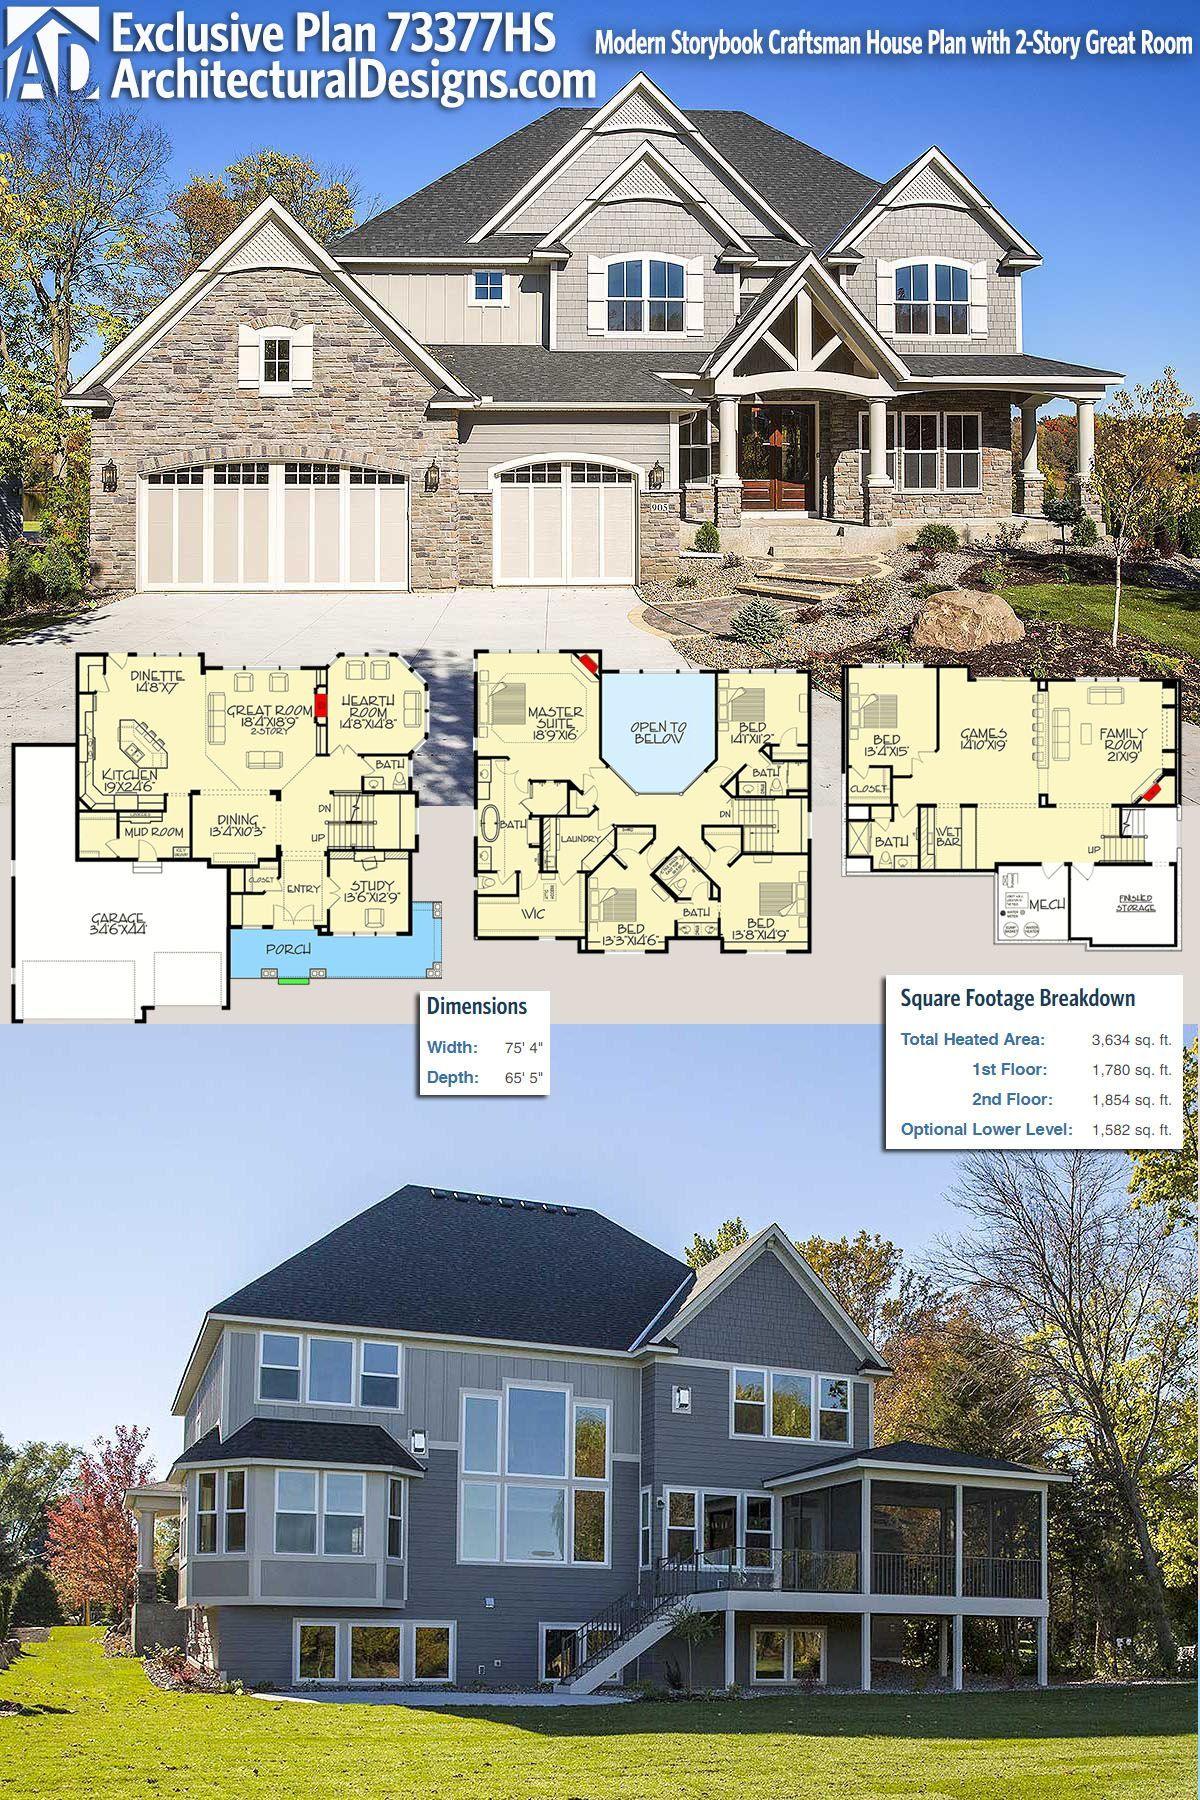 Plan 73377hs Modern Storybook Craftsman House With 2